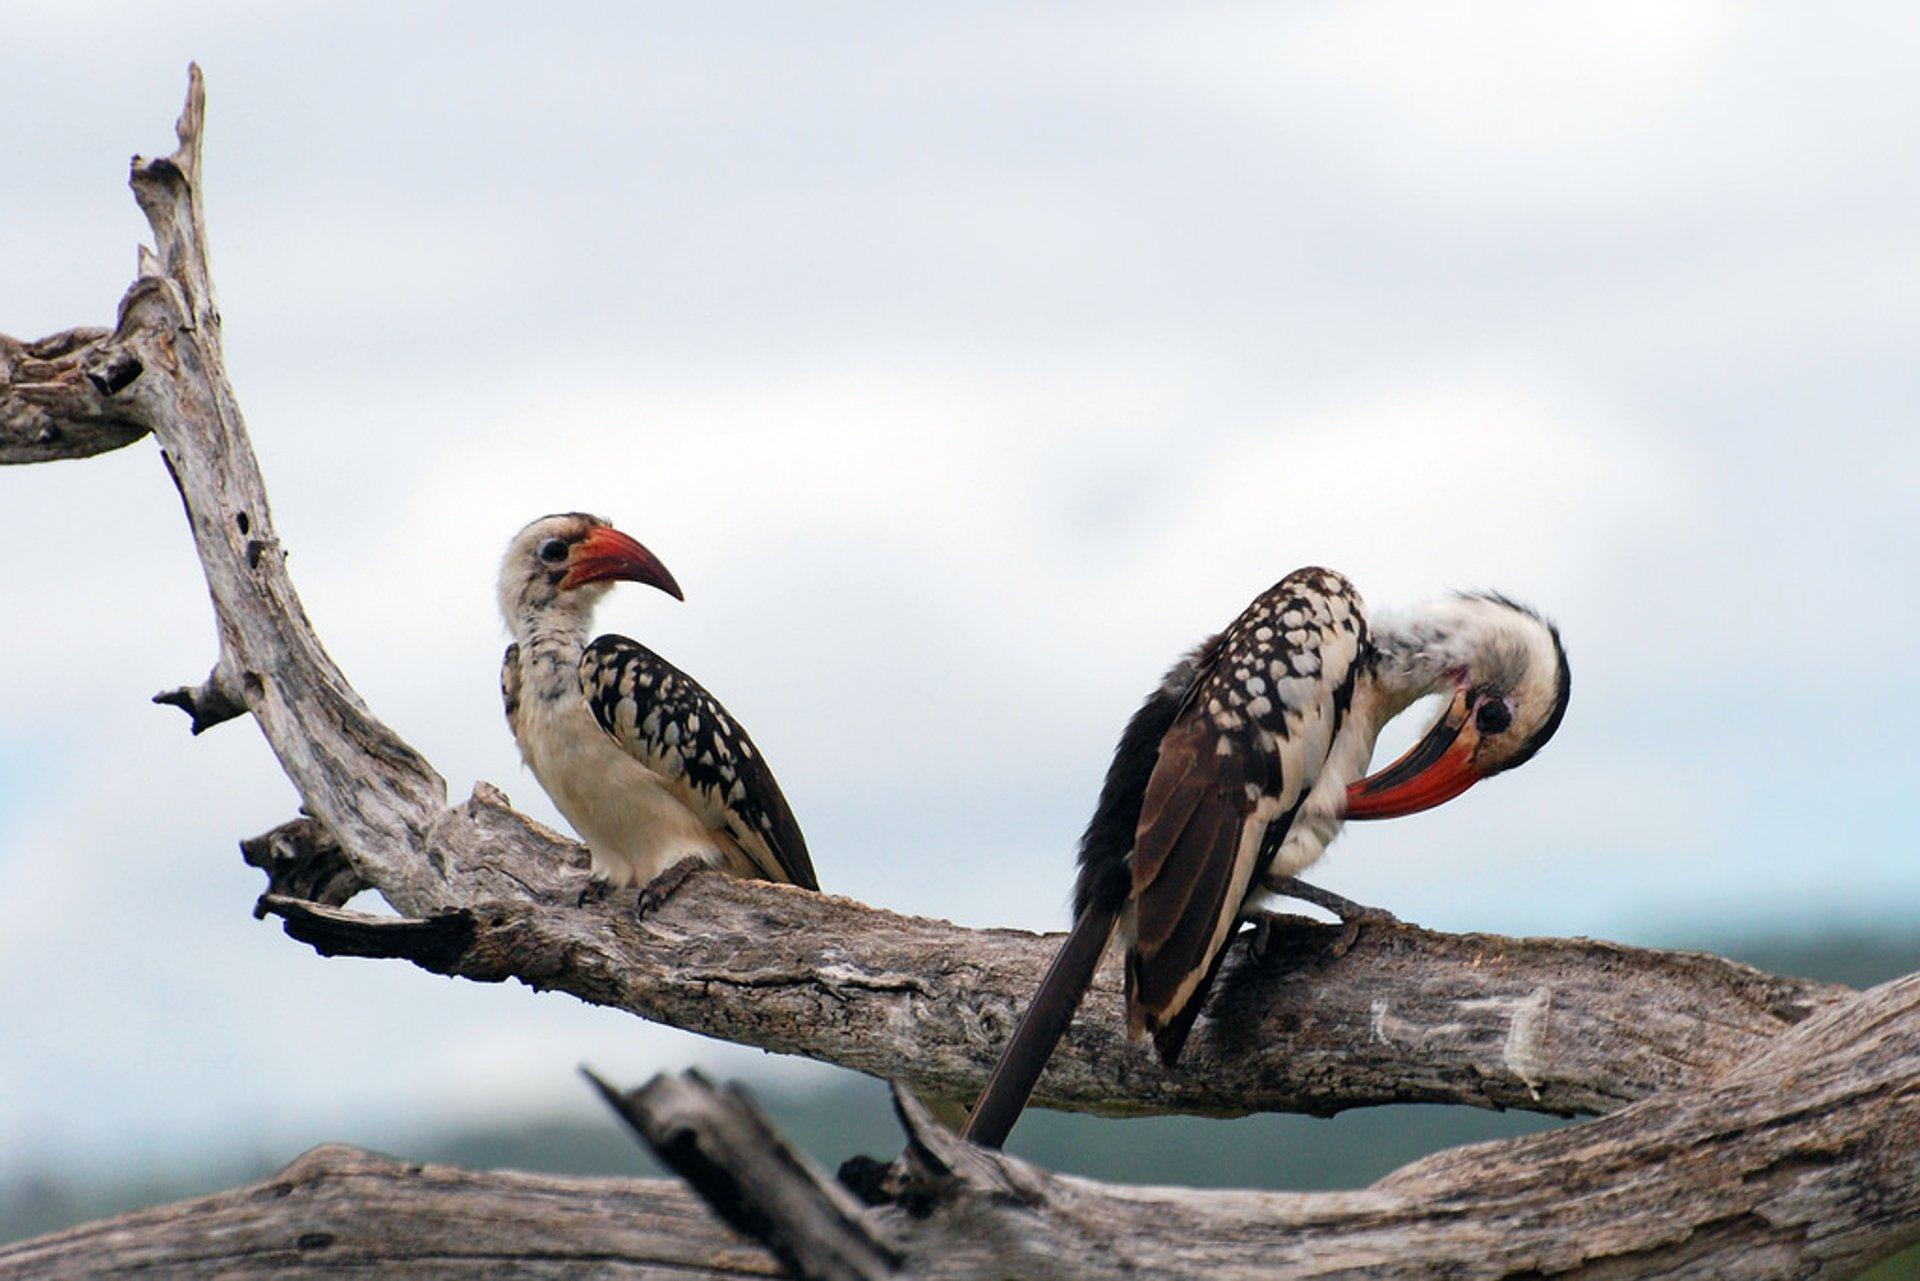 Birdwatching in Tanzania 2019 - Best Time